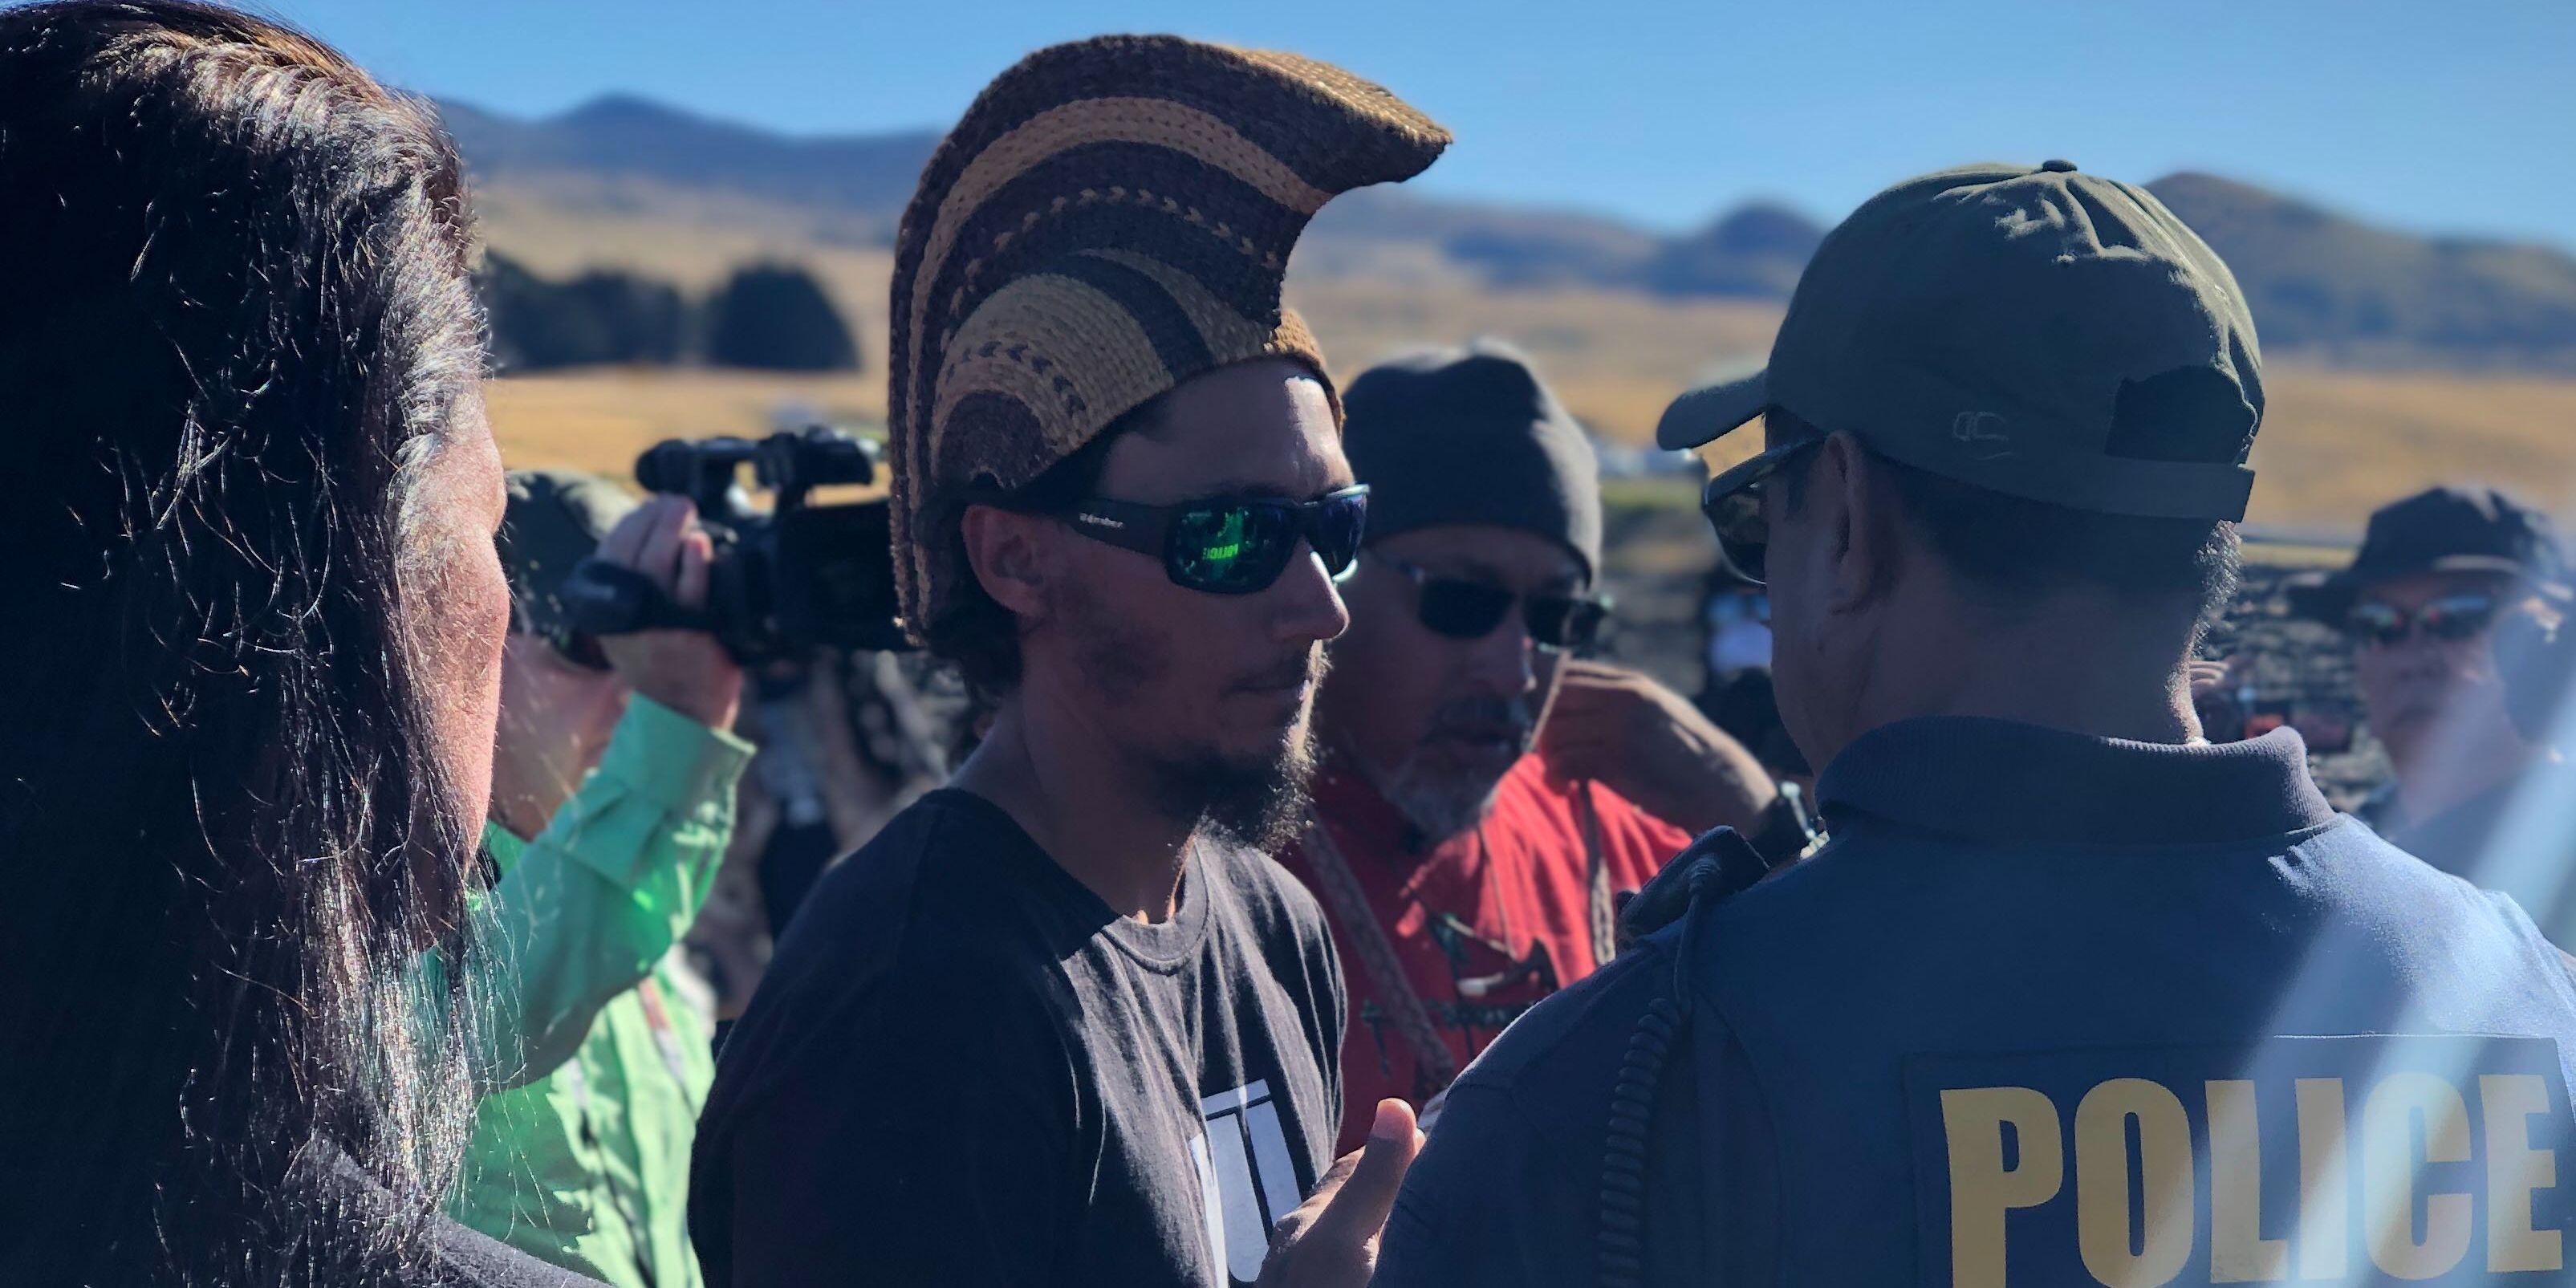 Watch protest leader Kahookahi Kanuha's message to demonstrators at Mauna Kea